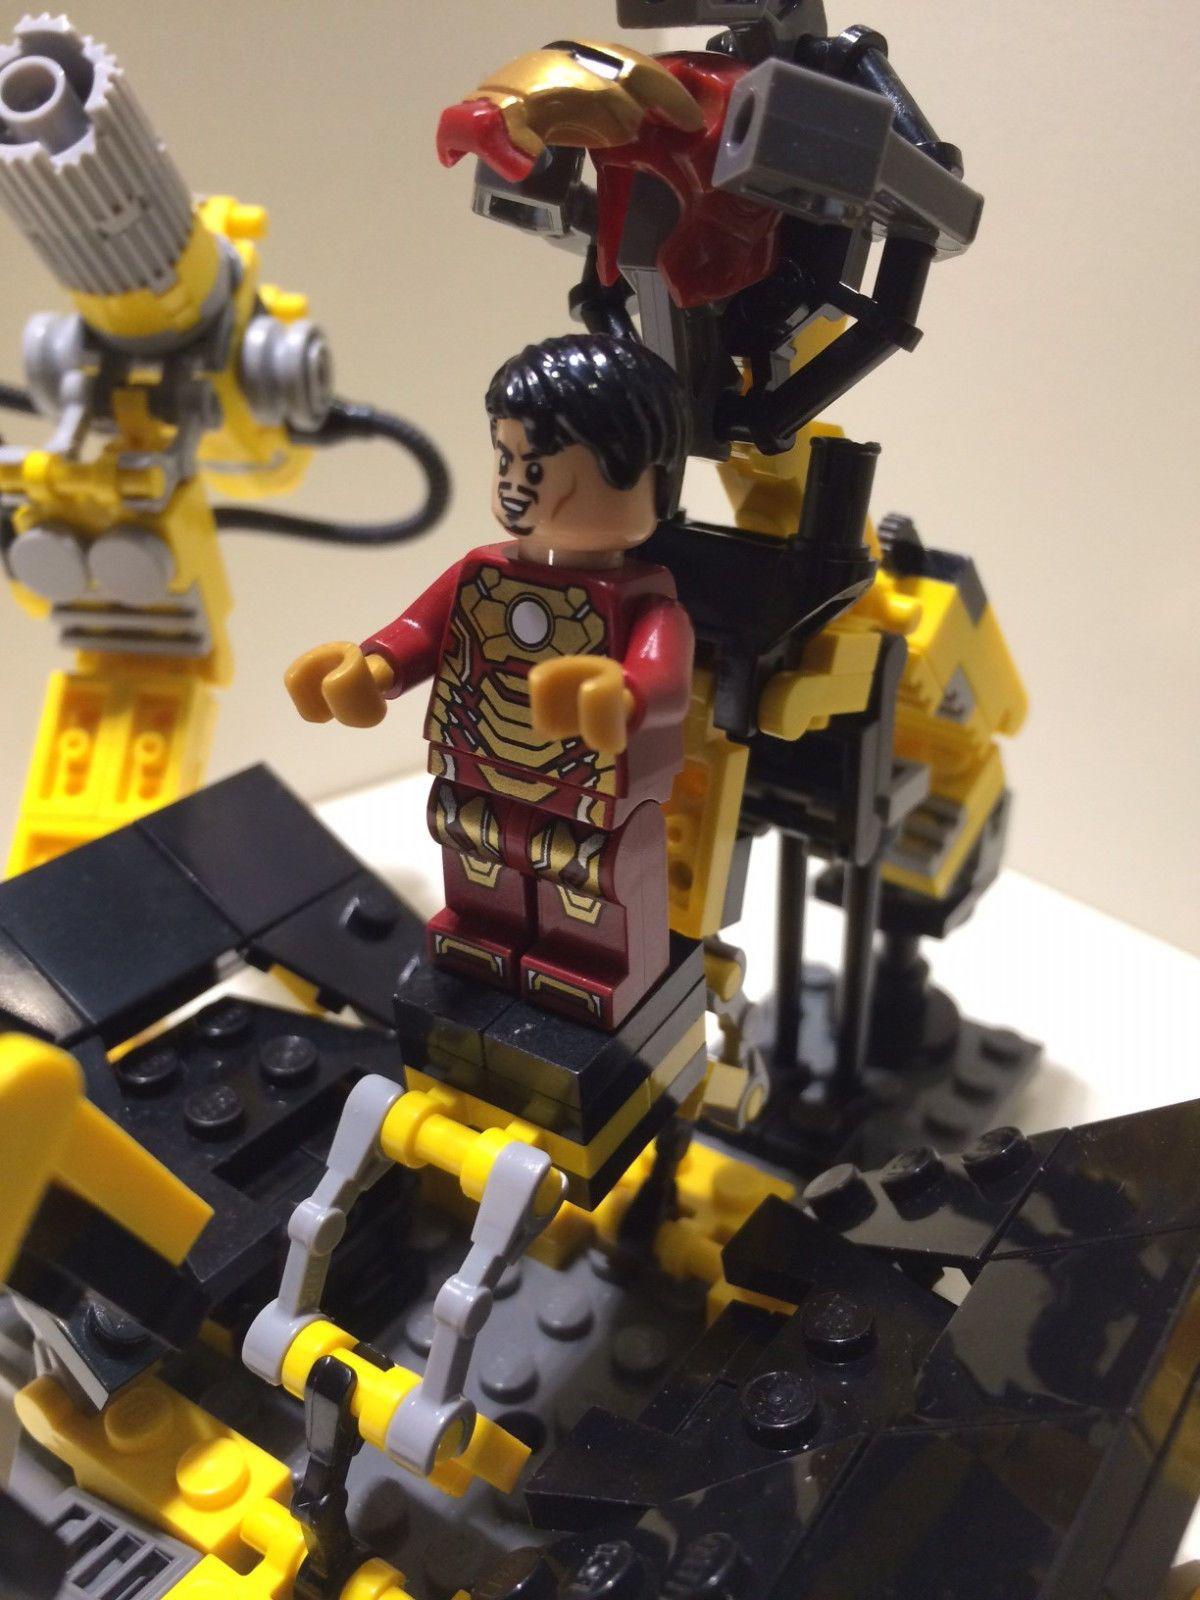 real lego iron man custom suit up gantry jarvis - Dessin Anim Lego City